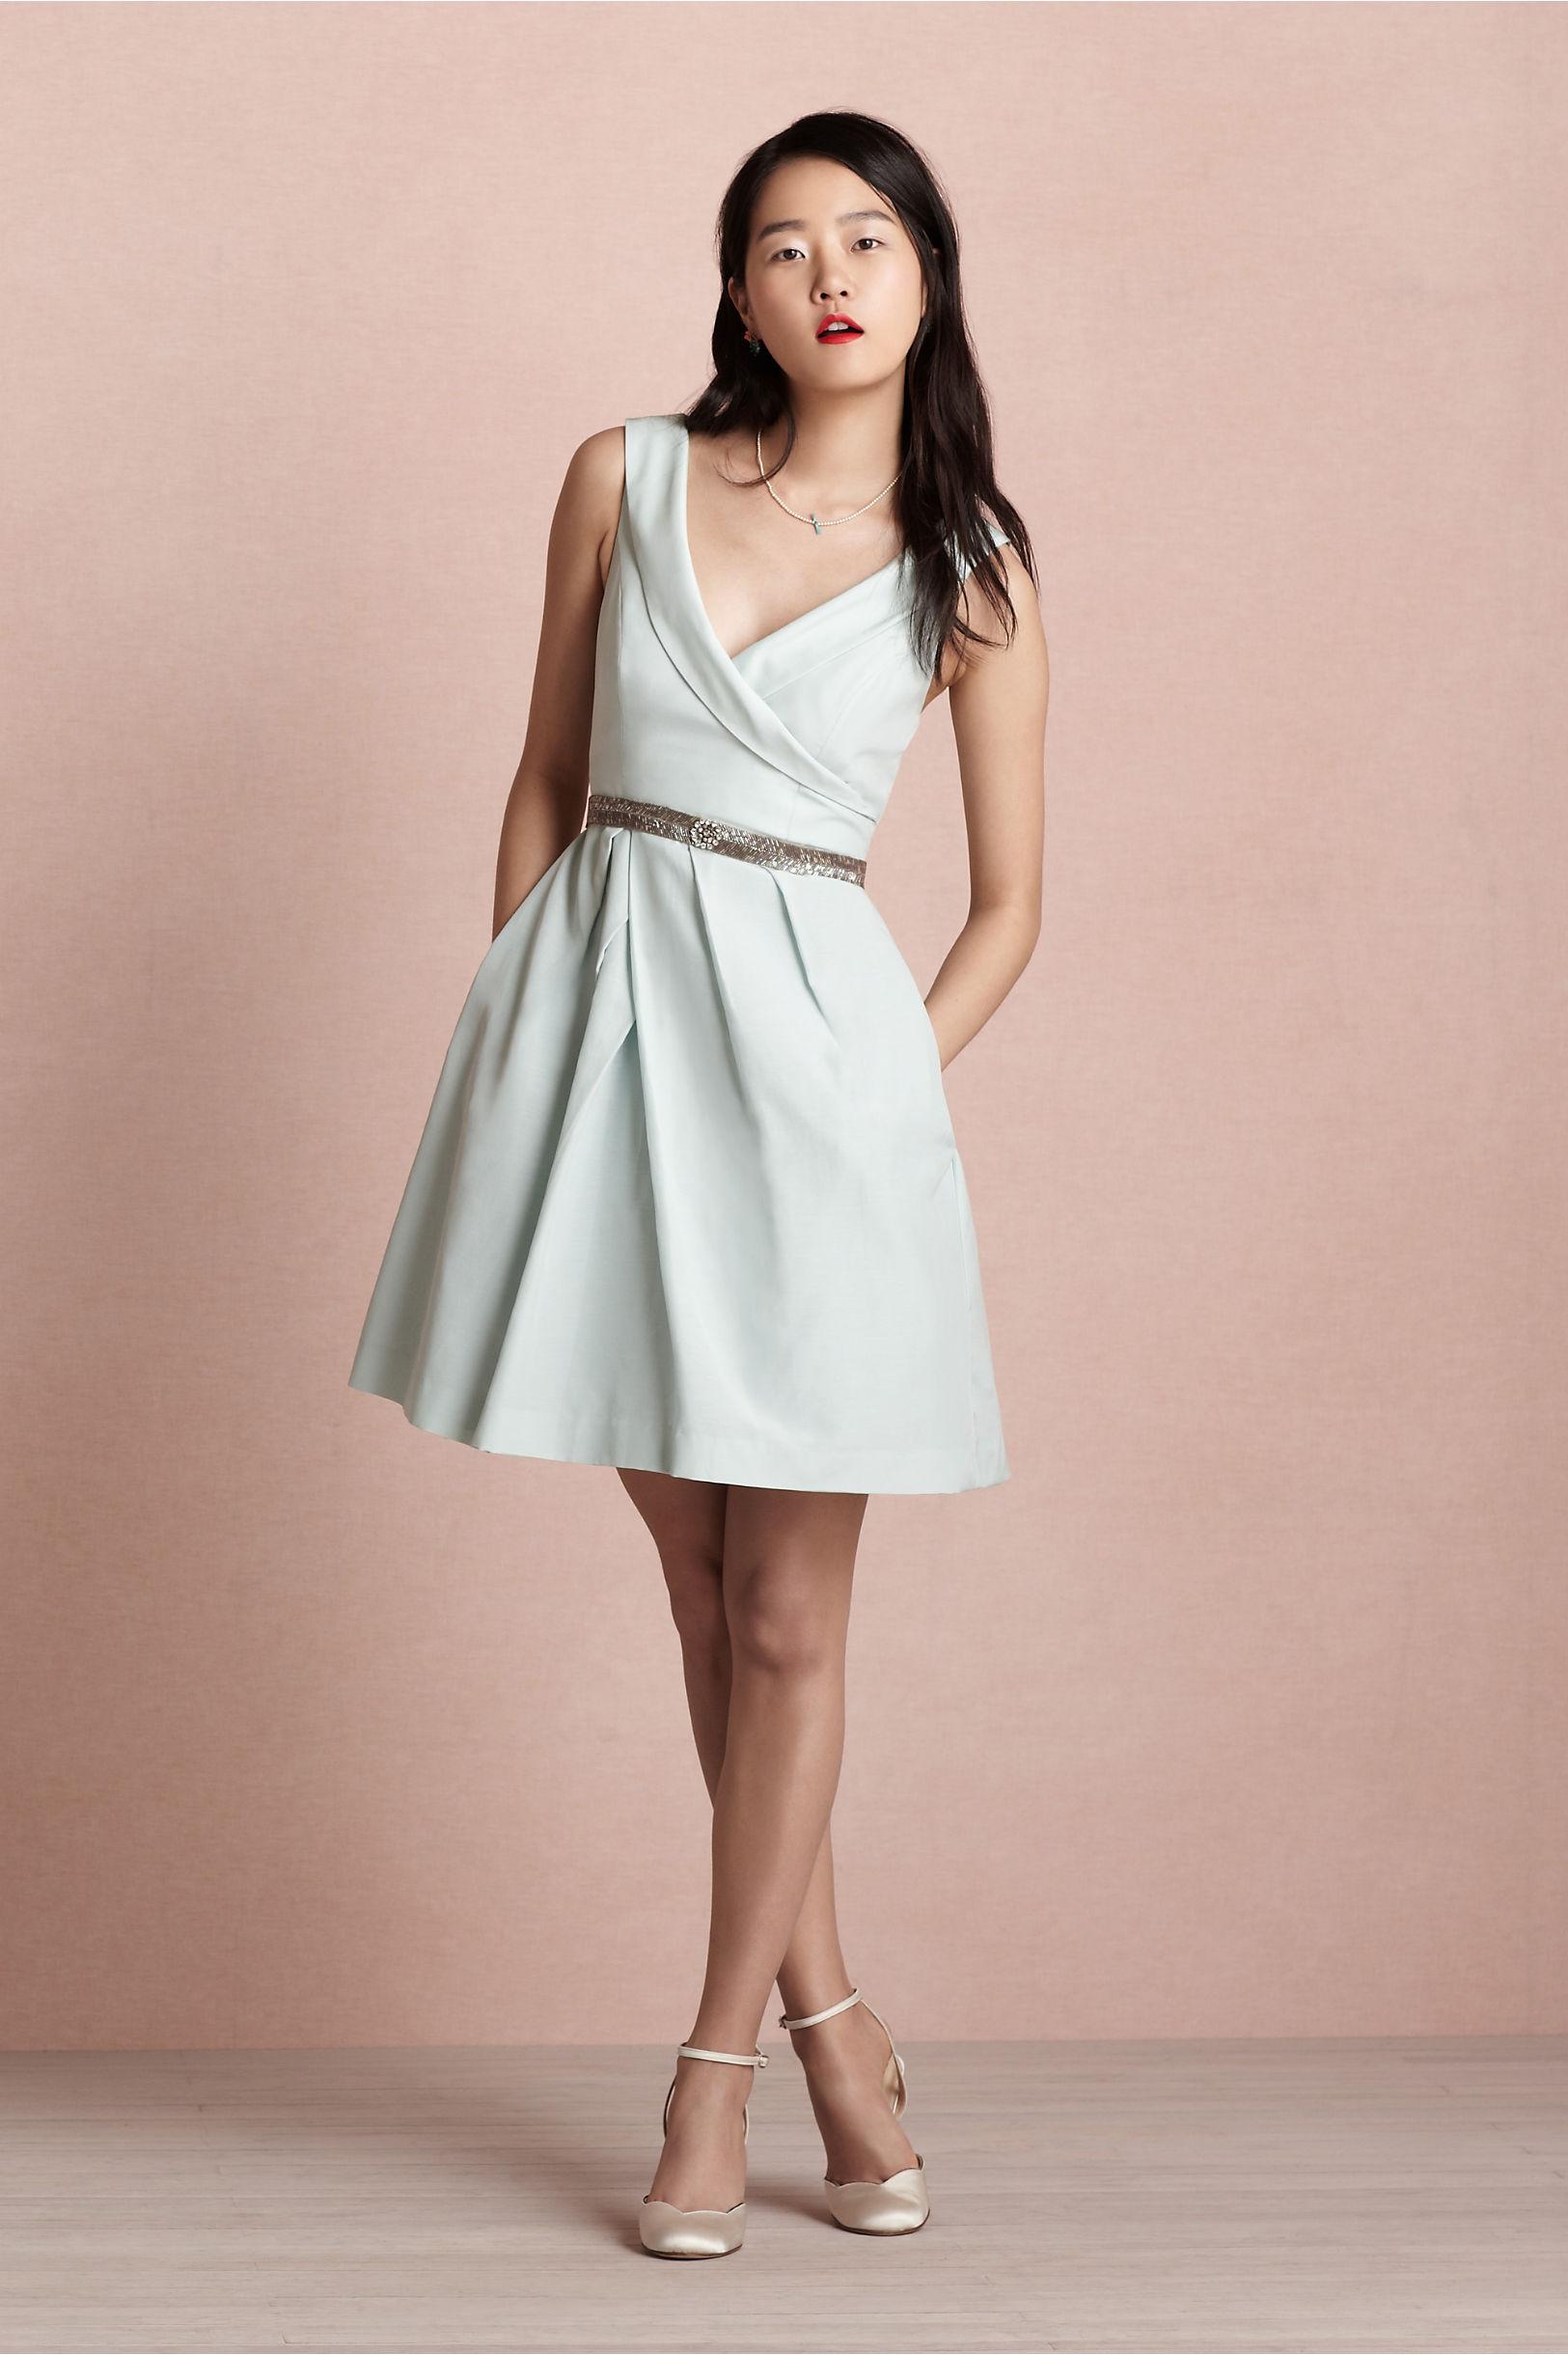 Feria Dress in Sale | BHLDN